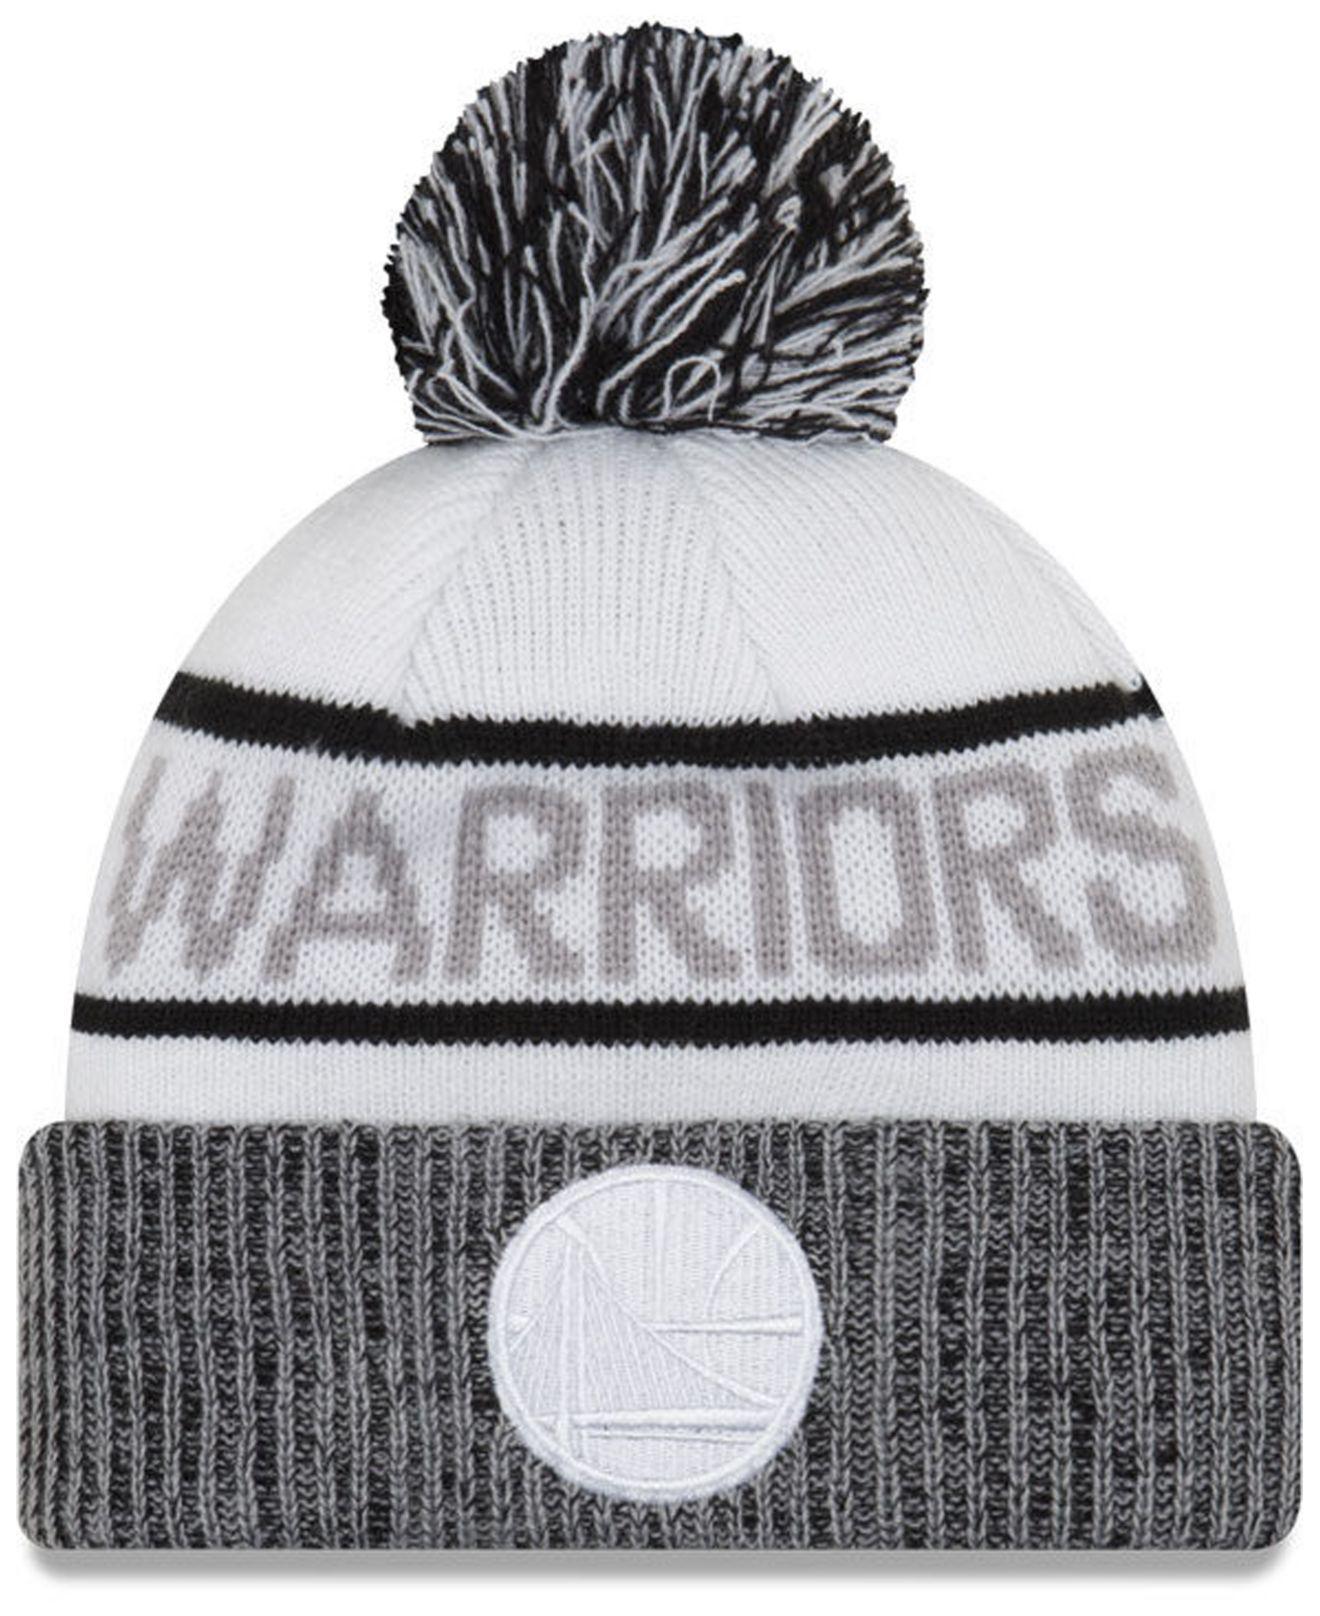 on sale 75cf9 740d7 KTZ Golden State Warriors Court Force Pom Knit Hat in White for Men ...